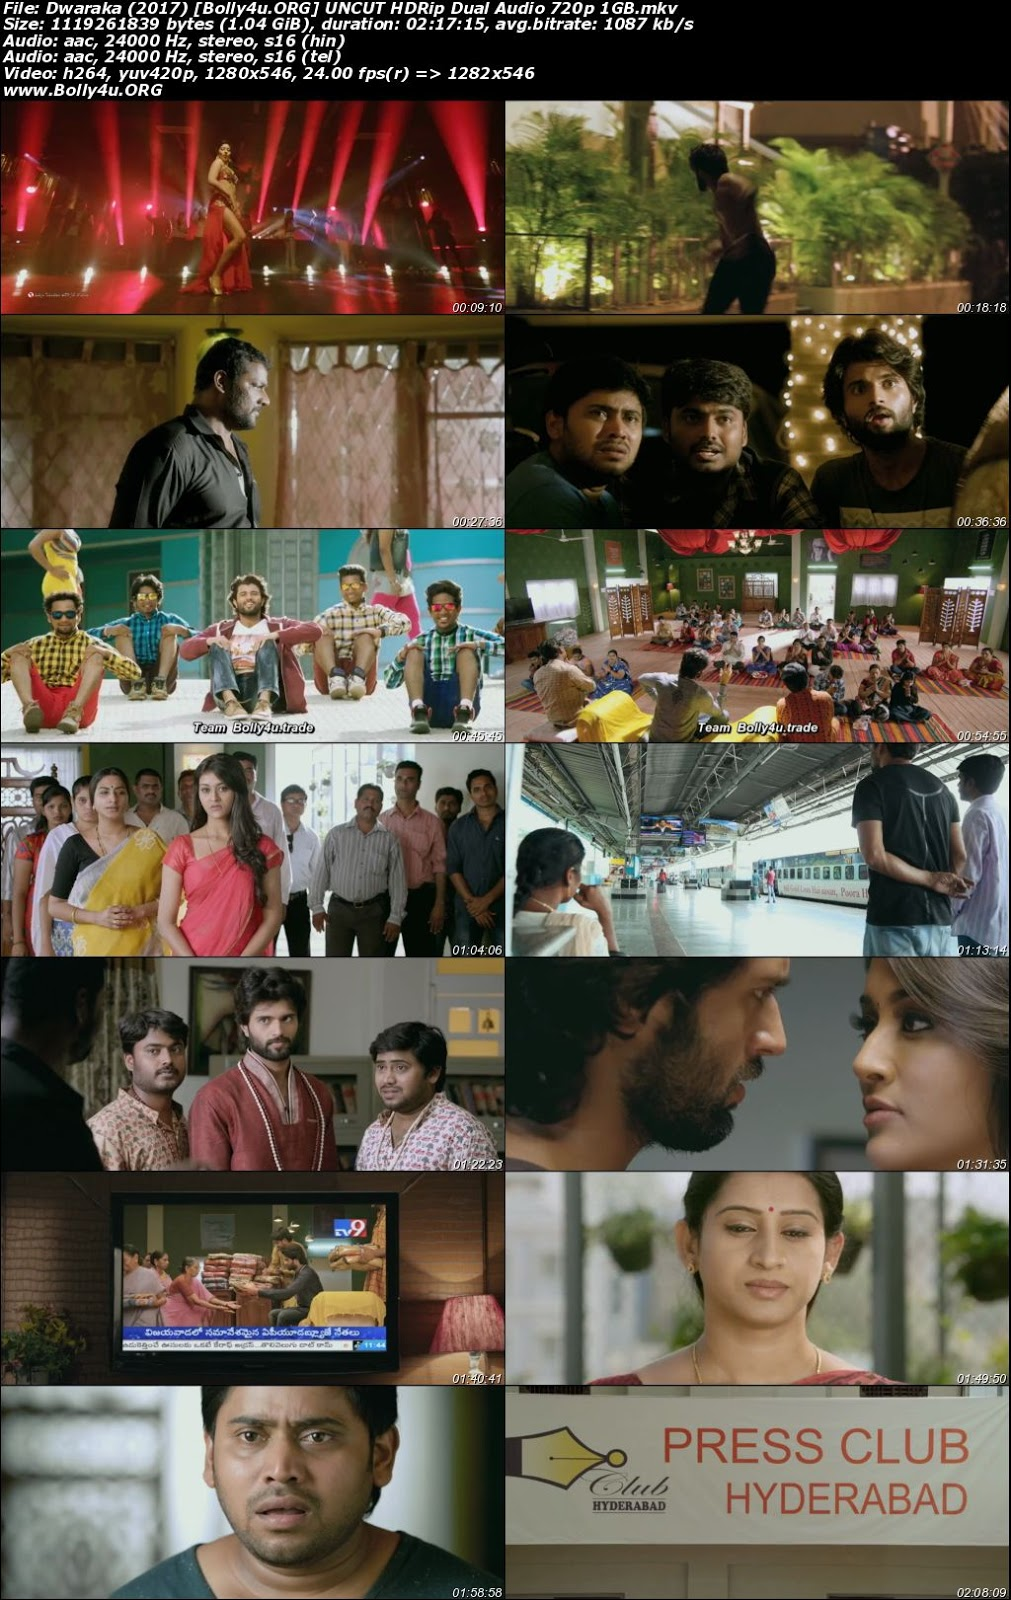 Dwaraka 2017 HDRip 1GB UNCUT Hindi Dual Audio 720p Download